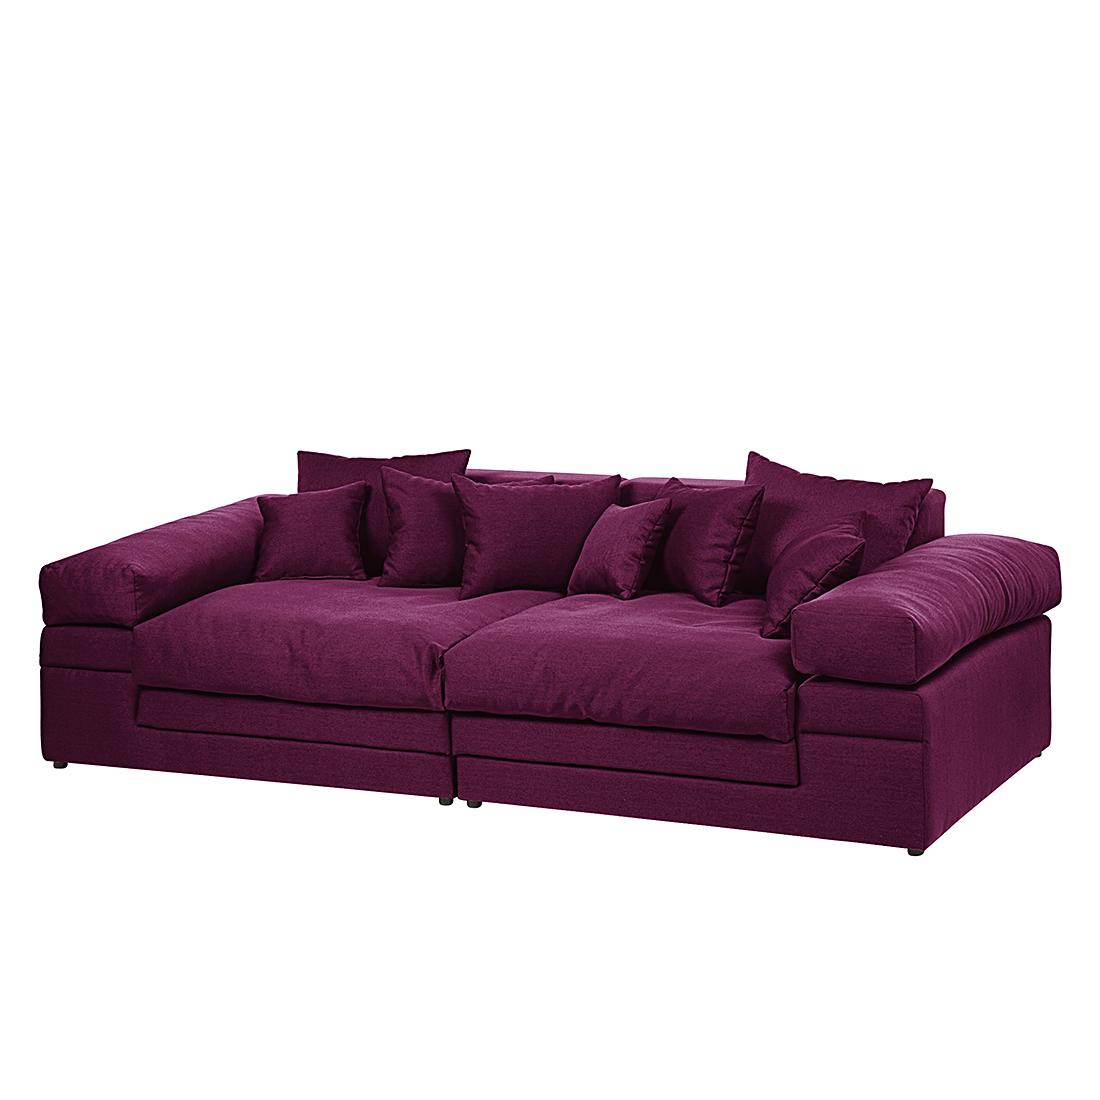 big sofa lila bestseller shop f r m bel und einrichtungen. Black Bedroom Furniture Sets. Home Design Ideas